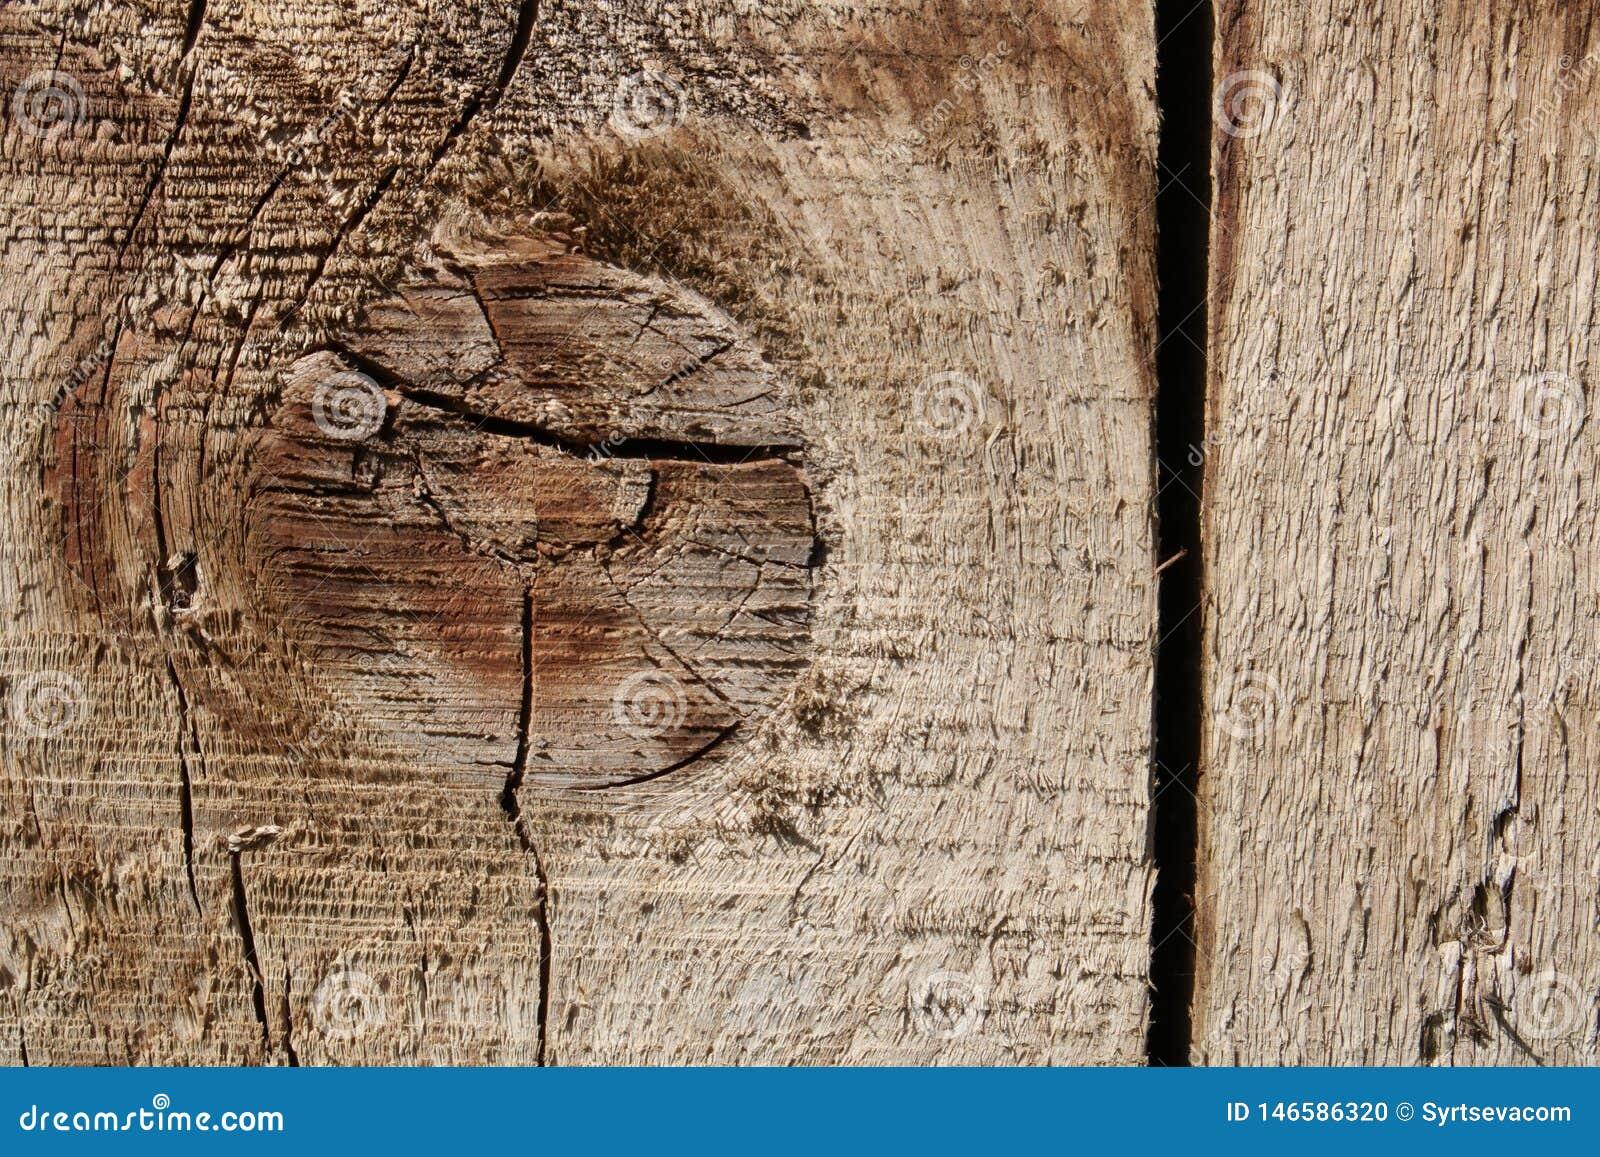 Uitstekende houten Raad met mooie textuur, close-up, met knoopelement en verticale barst